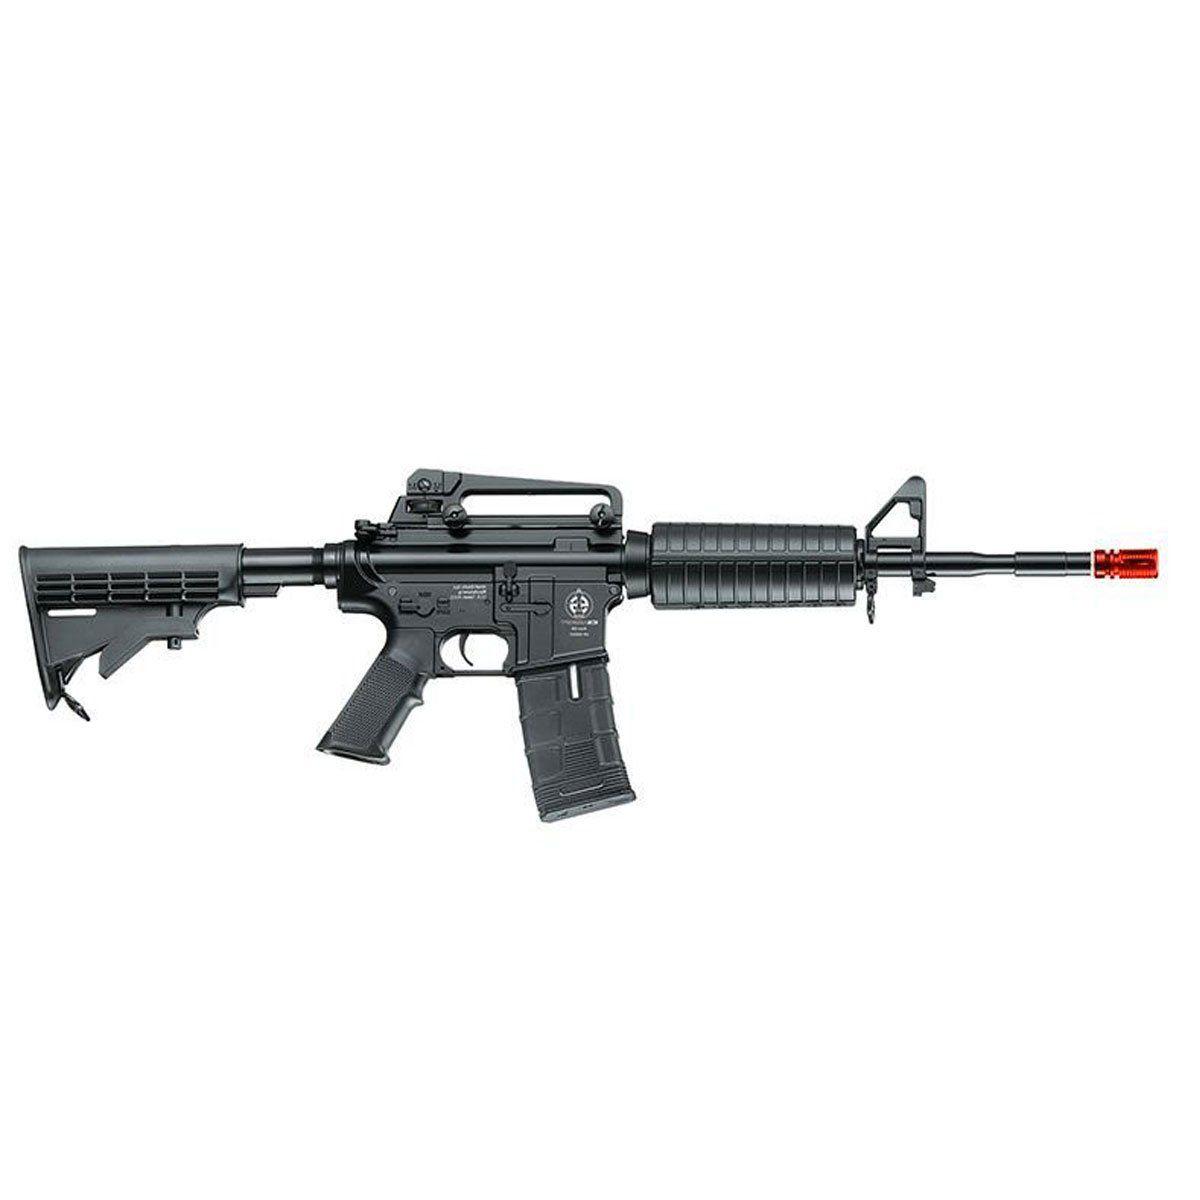 Rifle de Airsoft ICS M4a1 ICS-41 elétrica 6mm